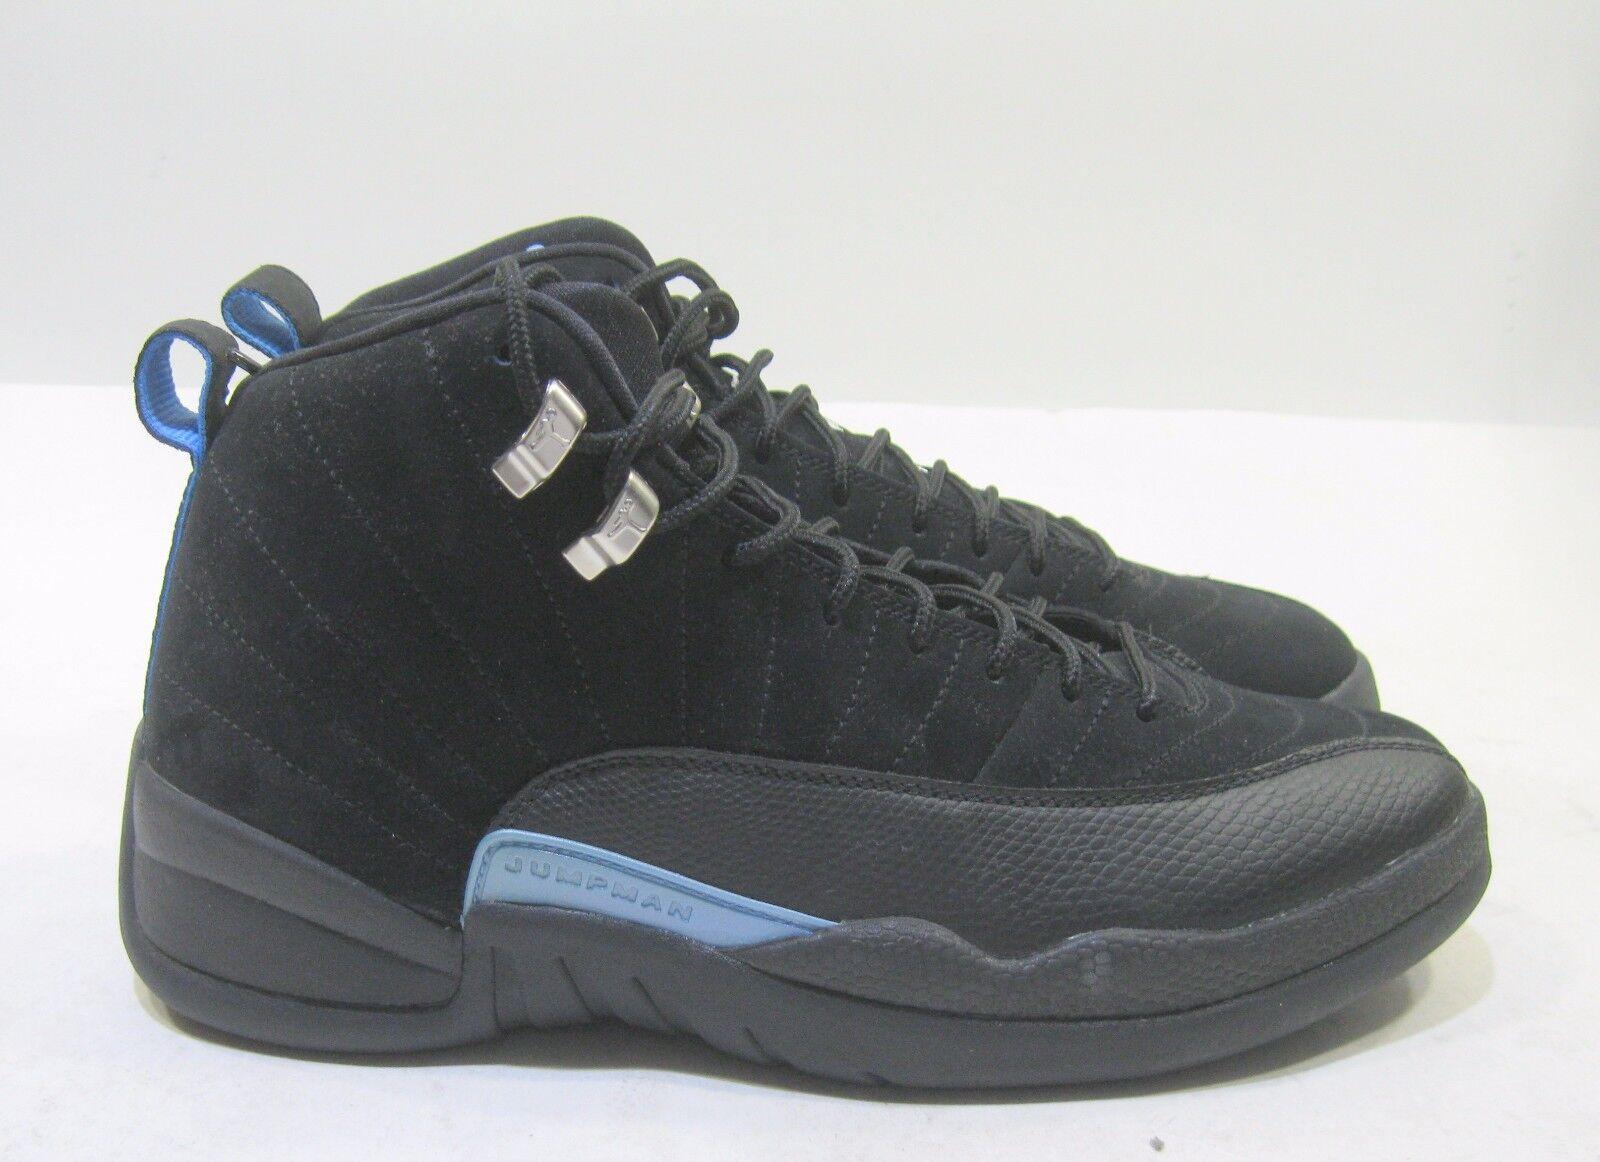 Nike Noir Hommes Air Jordan 12 Retro